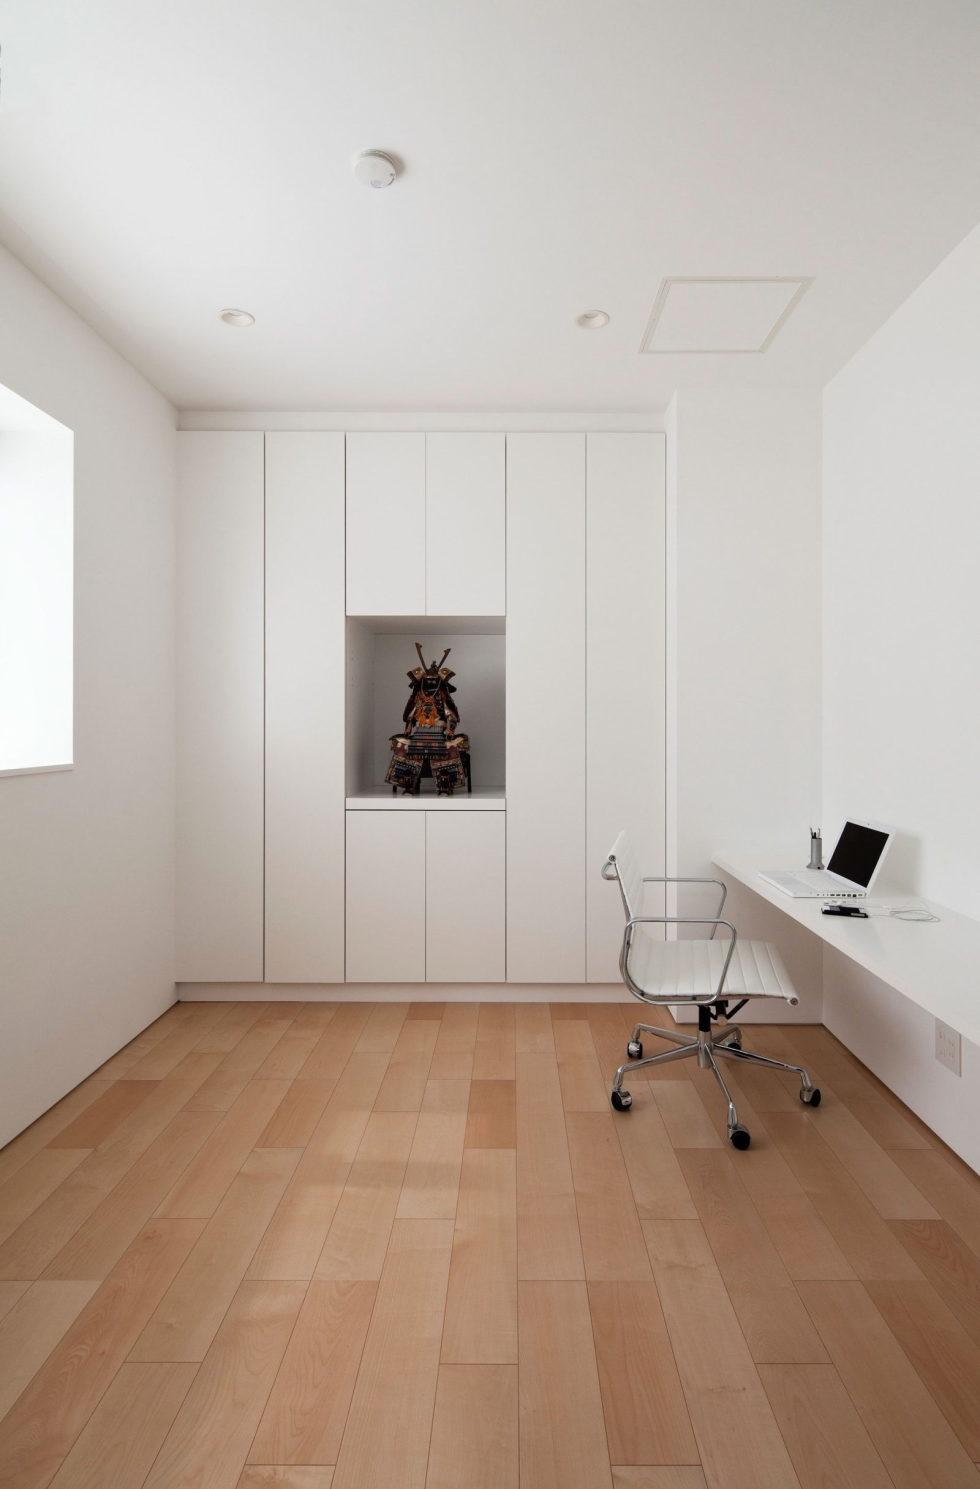 Zen Design House From RCK Design Studio In Japan 25